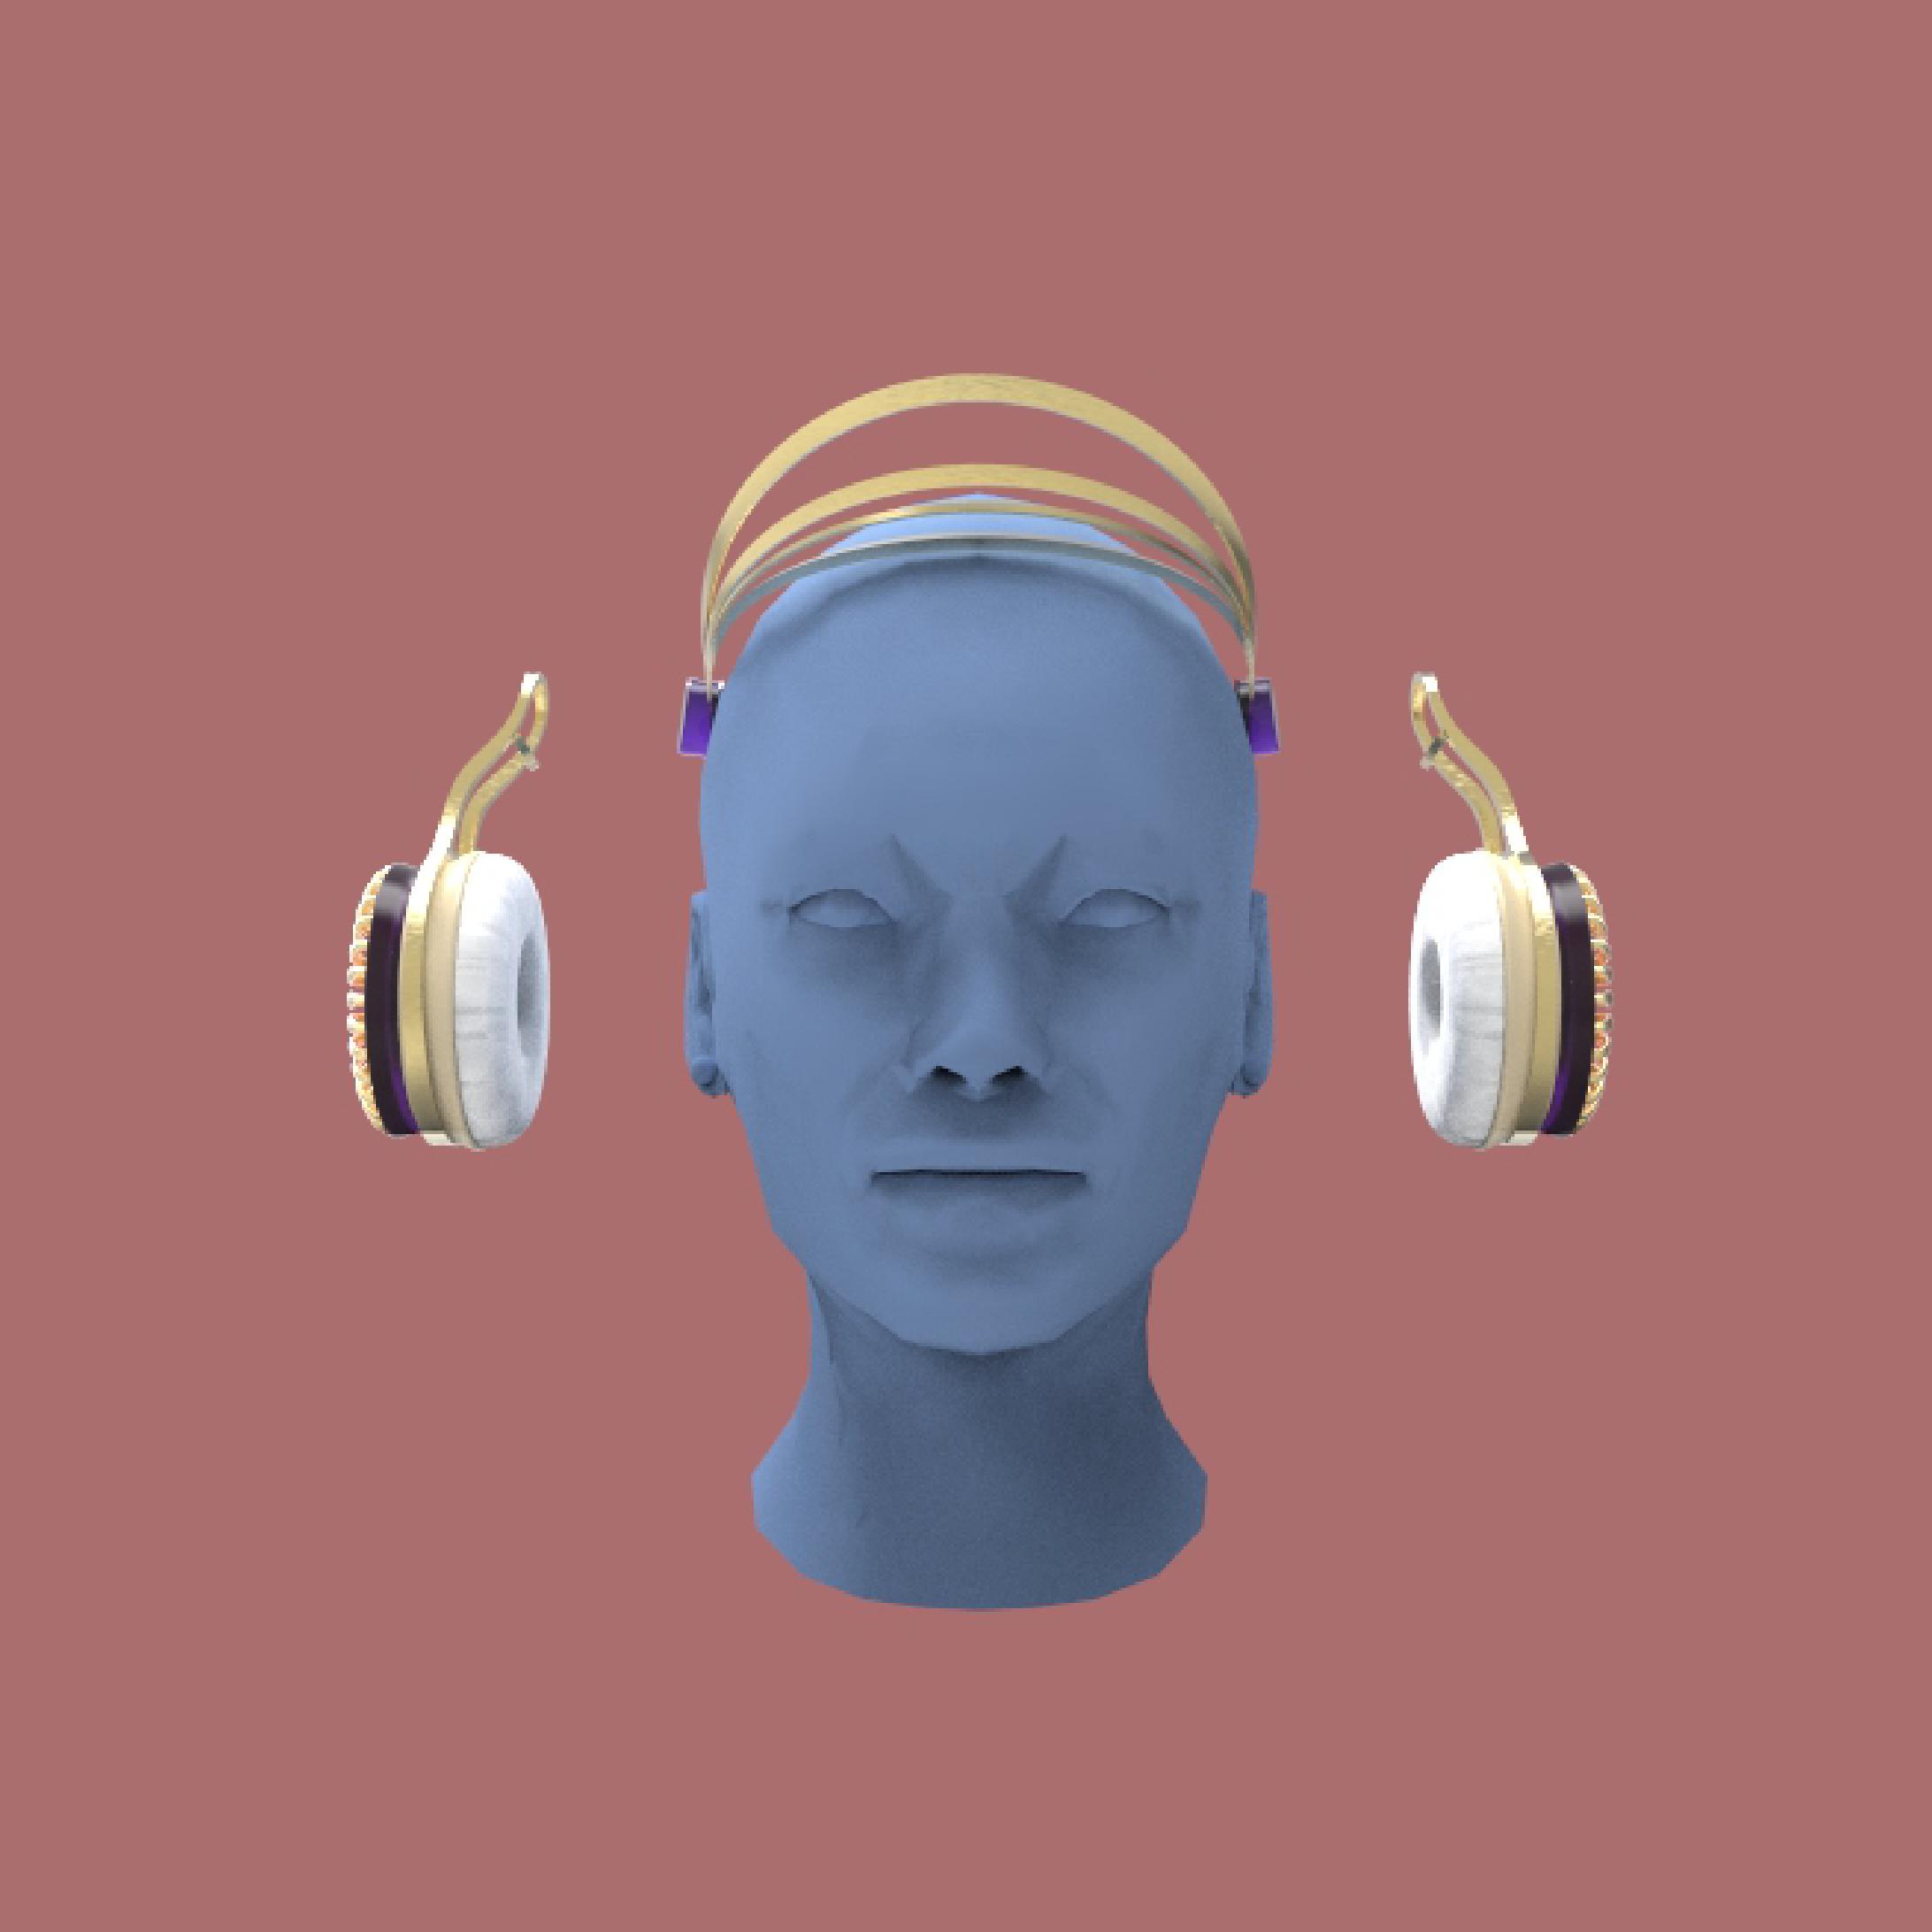 headphone3.png